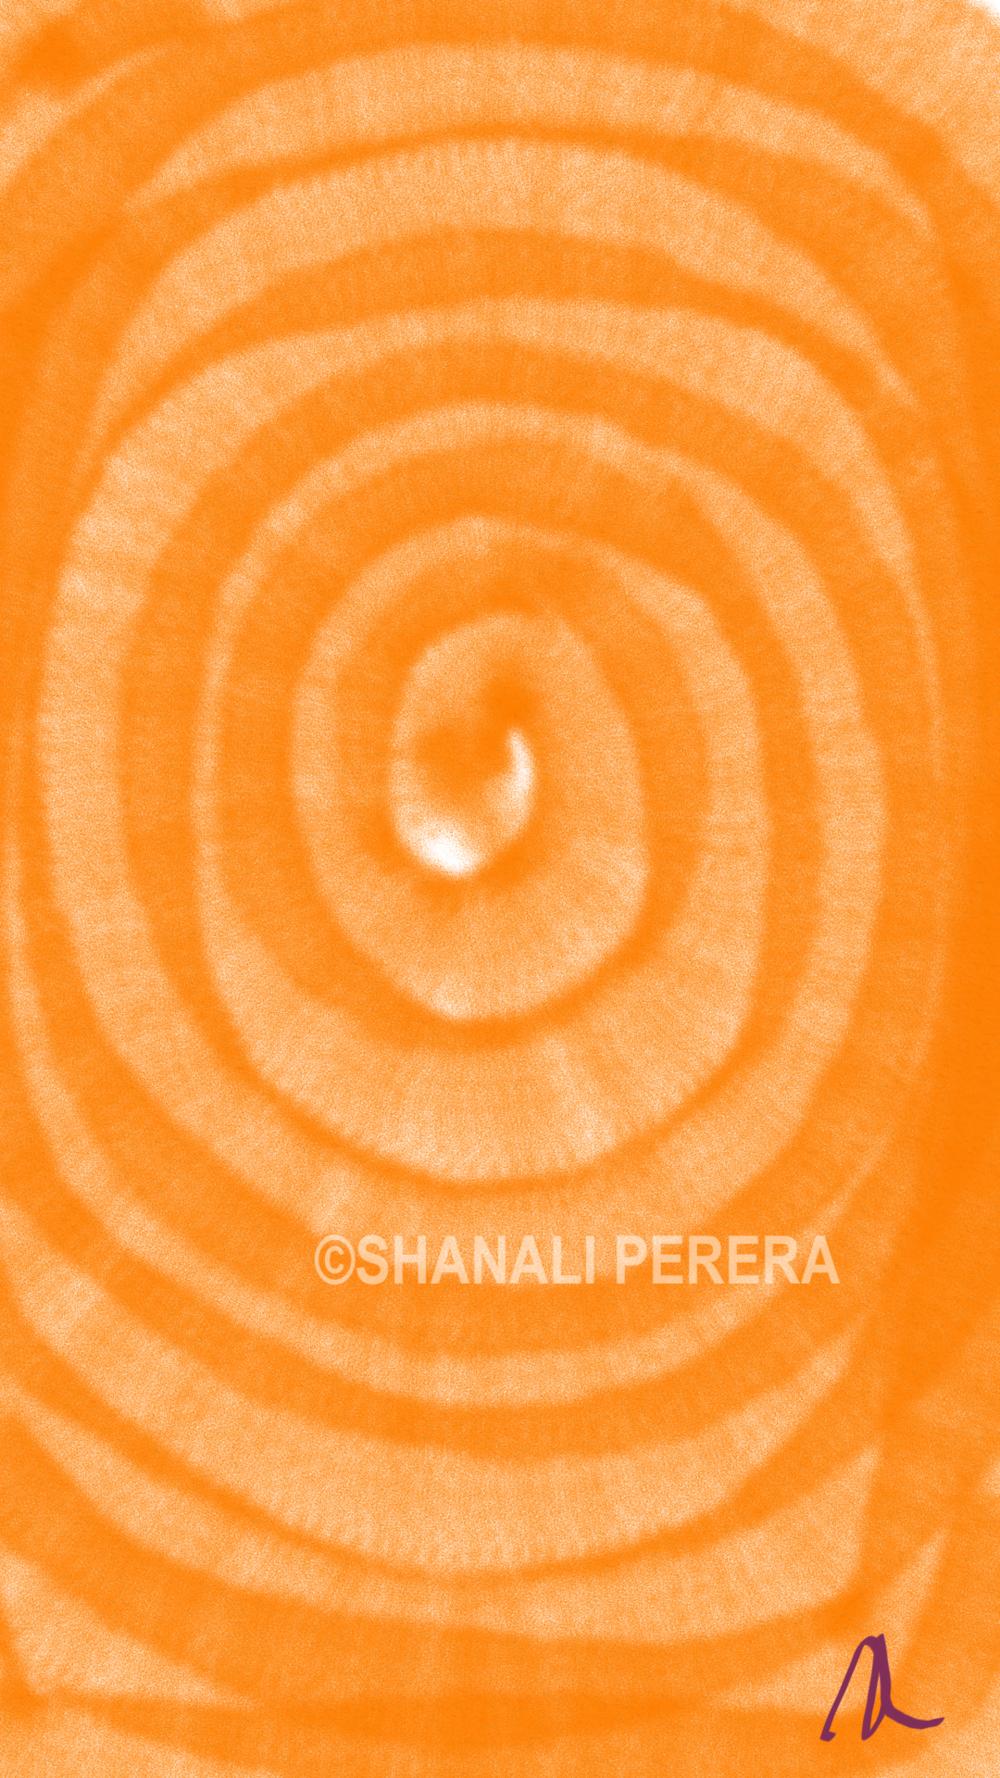 sketch-1523106549695.png